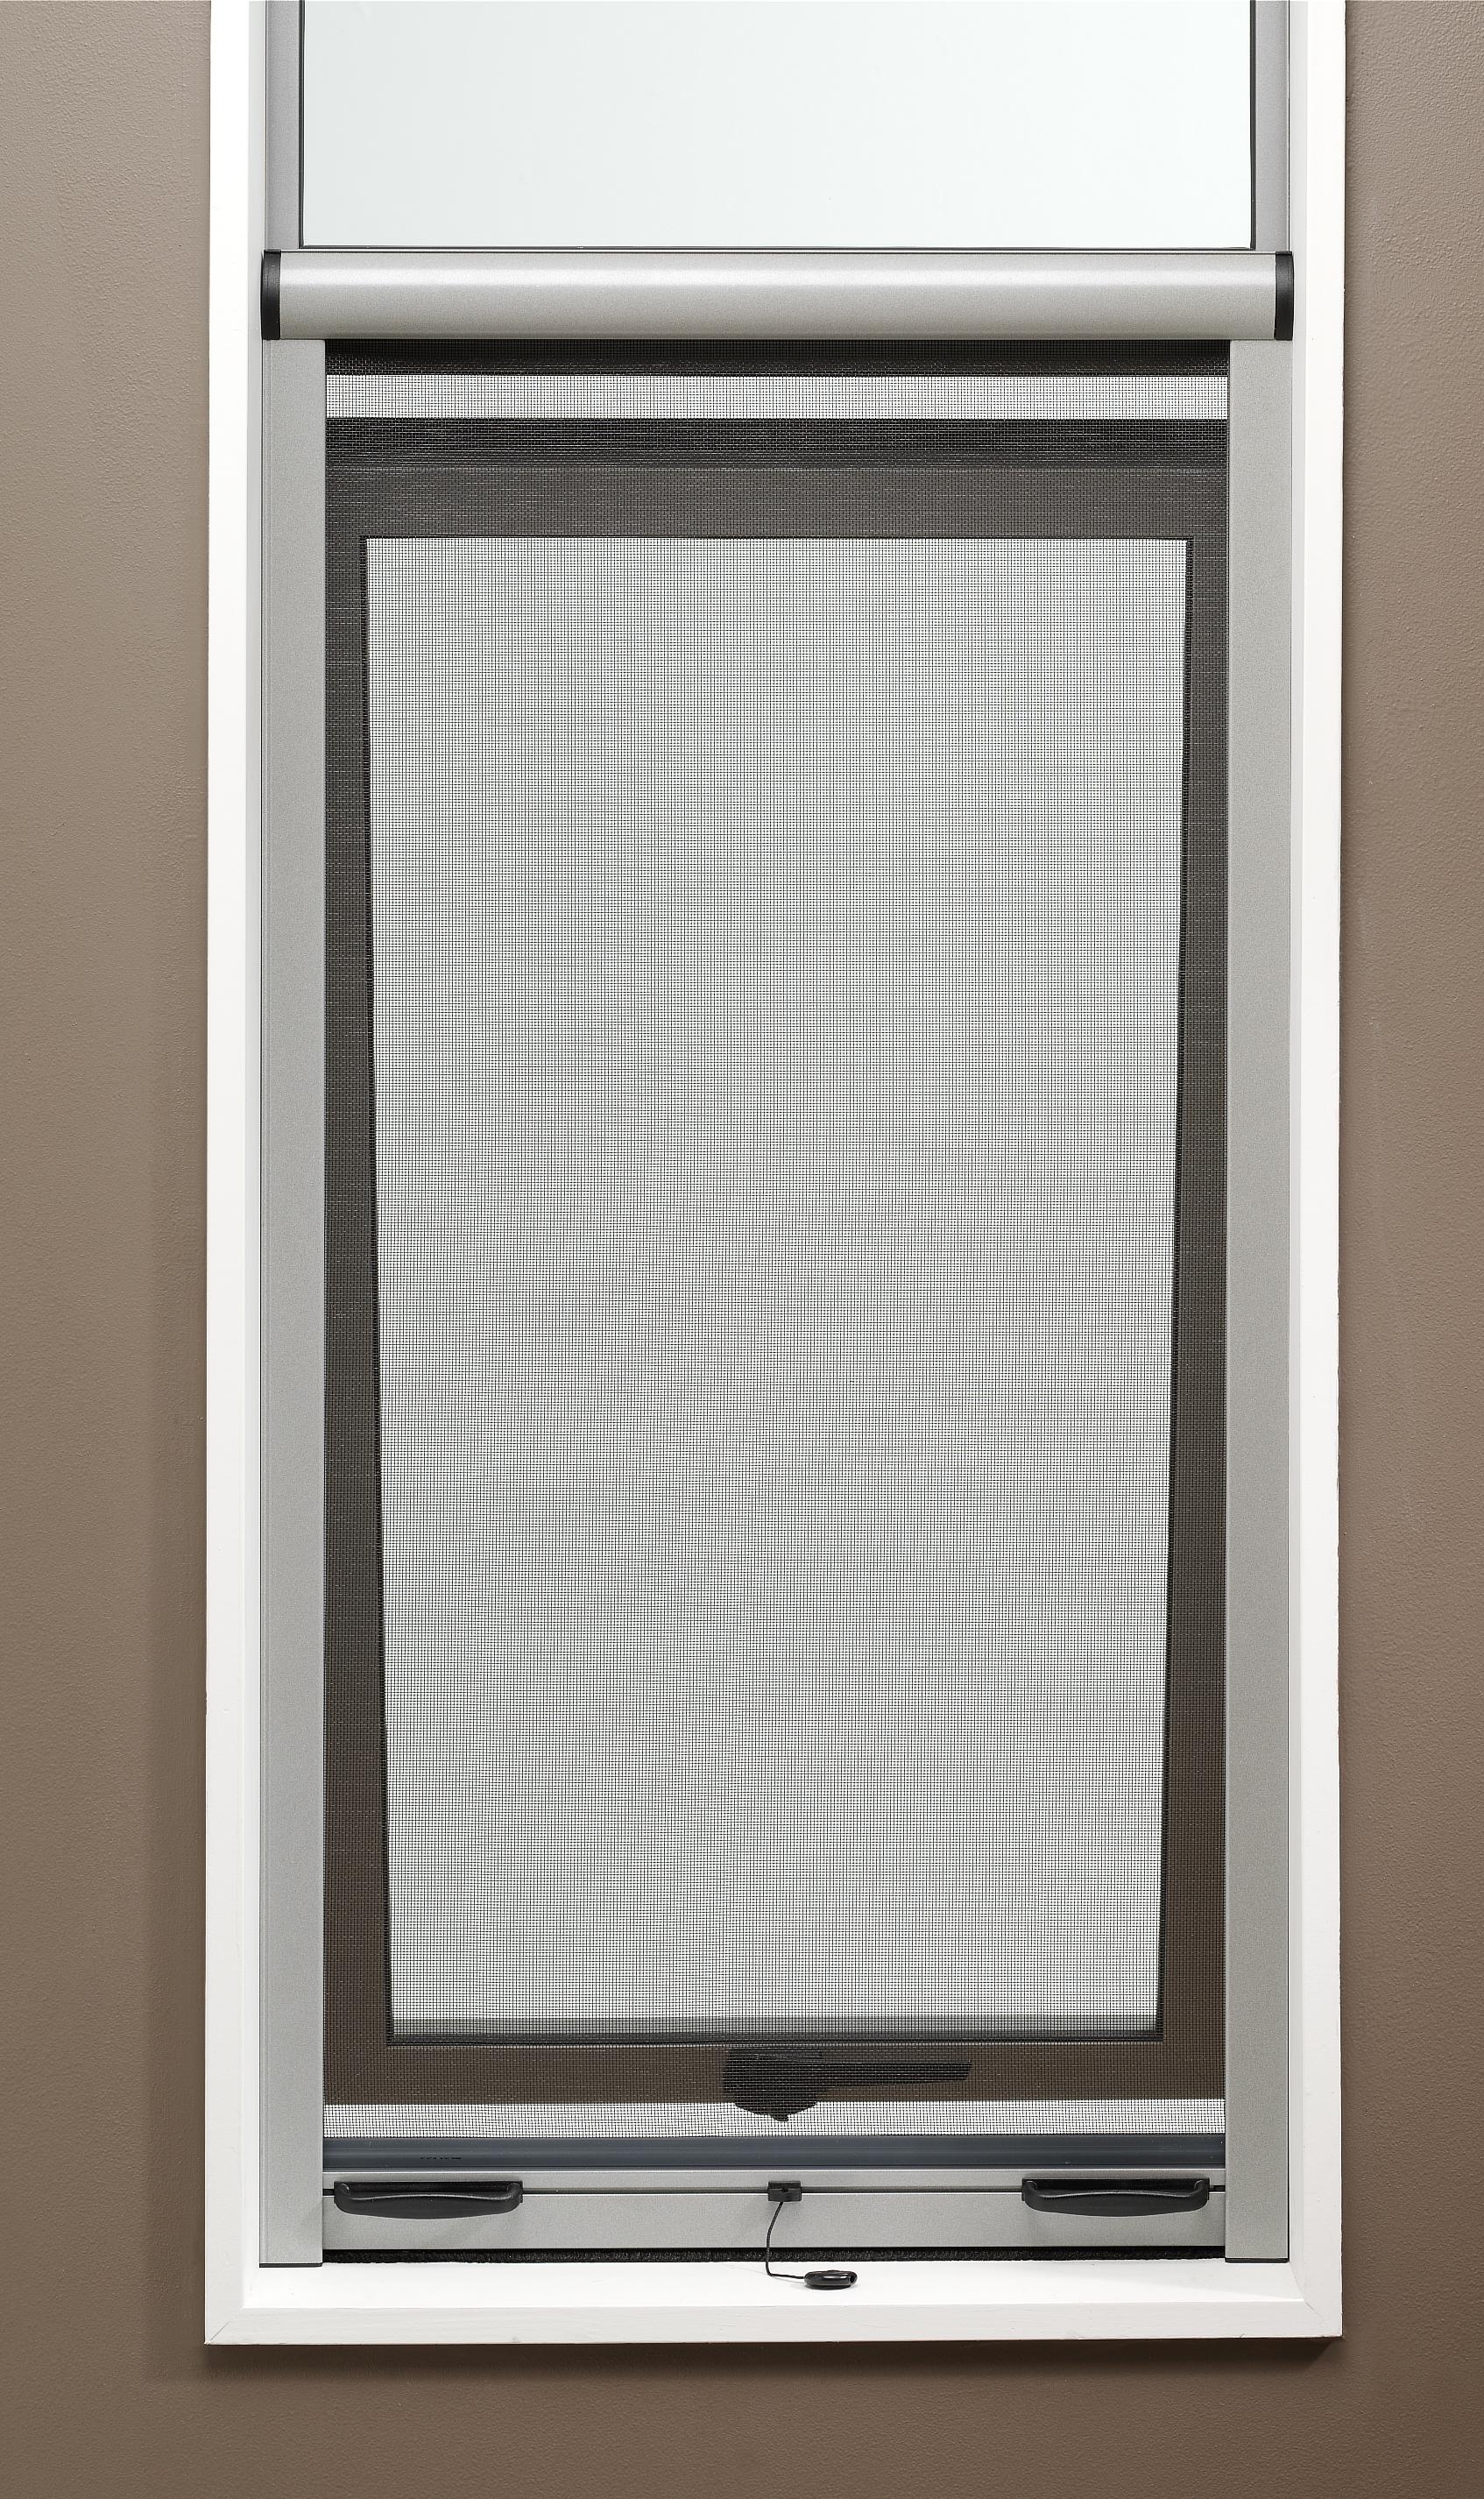 Genius Retractable Screens - Frazerhurst Curtains and Blinds